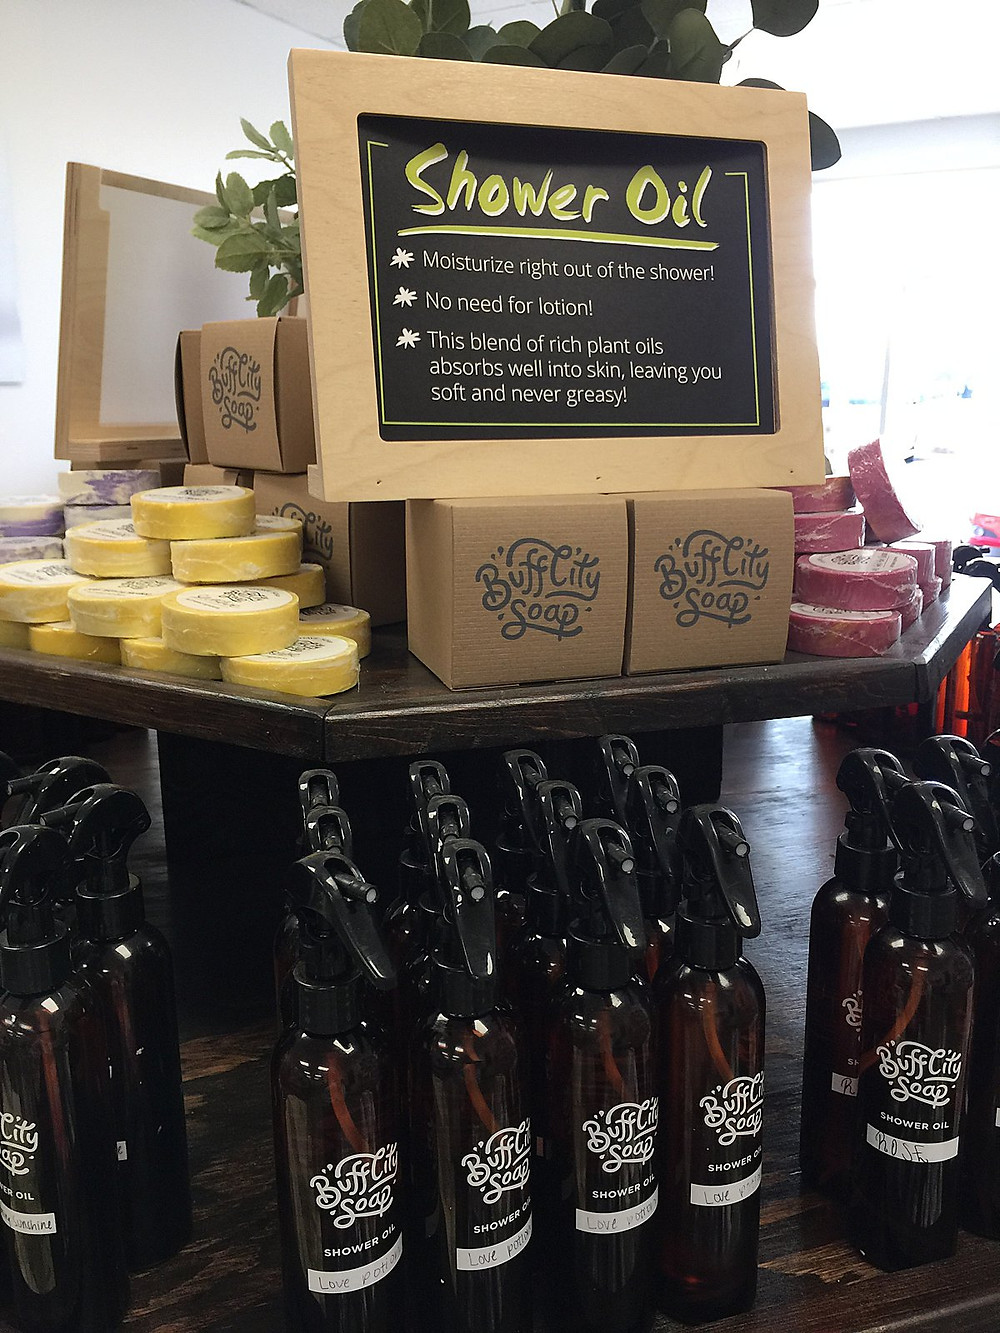 Buff City Soap - Shower Oil